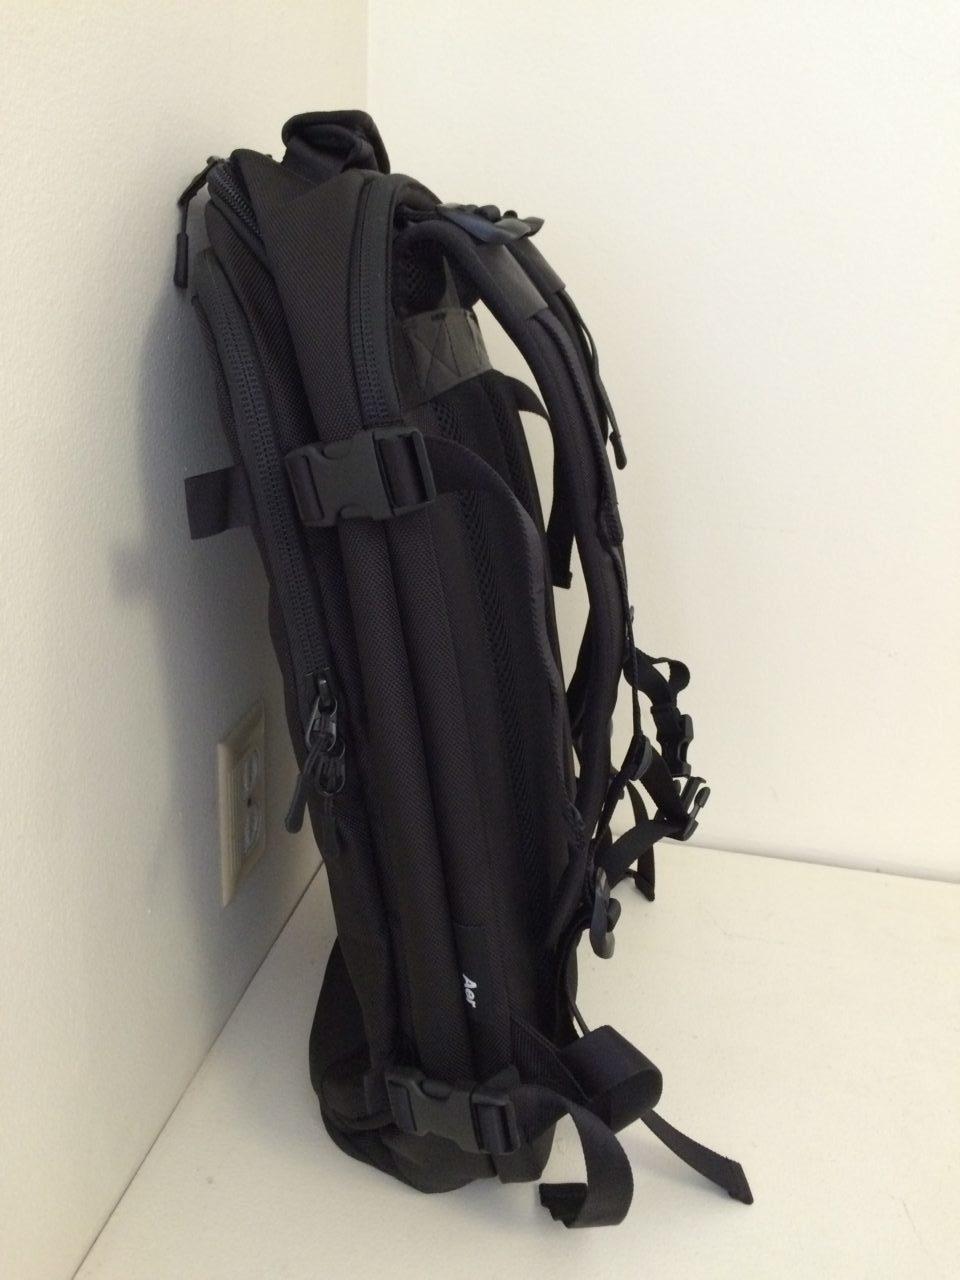 Aer Travel Pack compressed